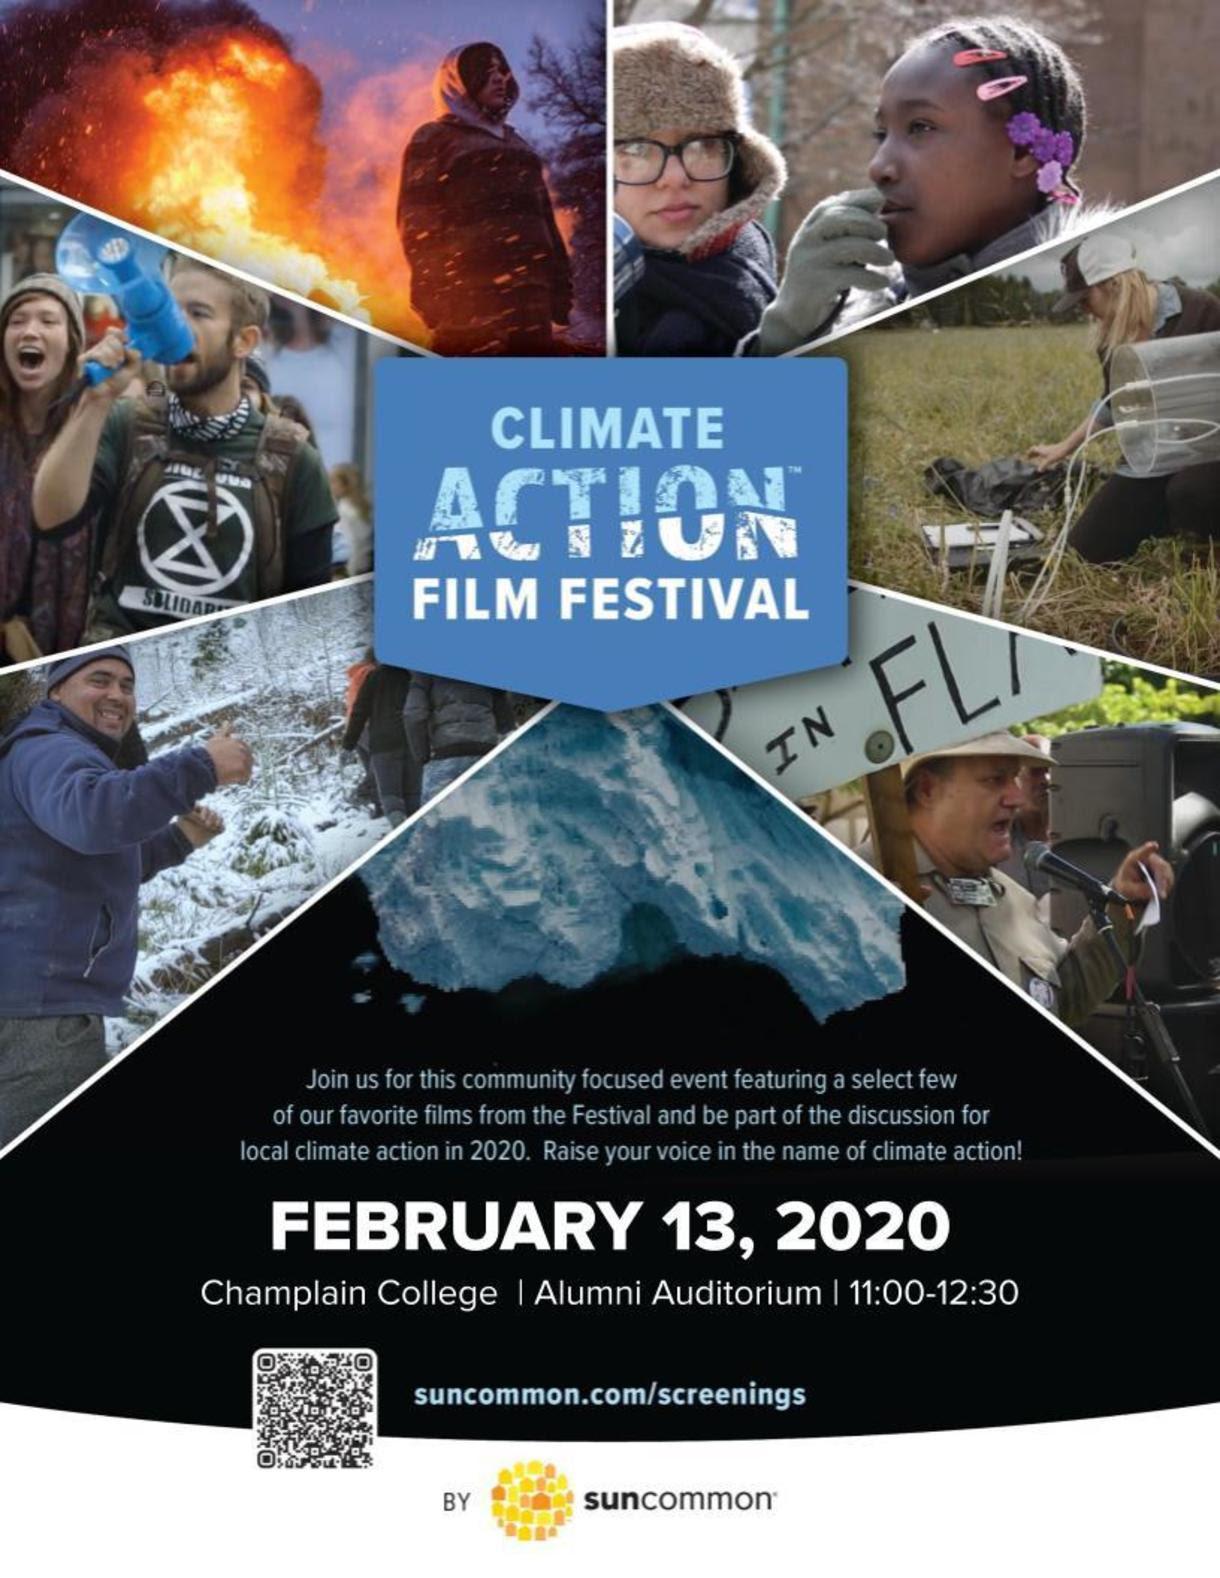 Climate Film Fest - Feb. 13